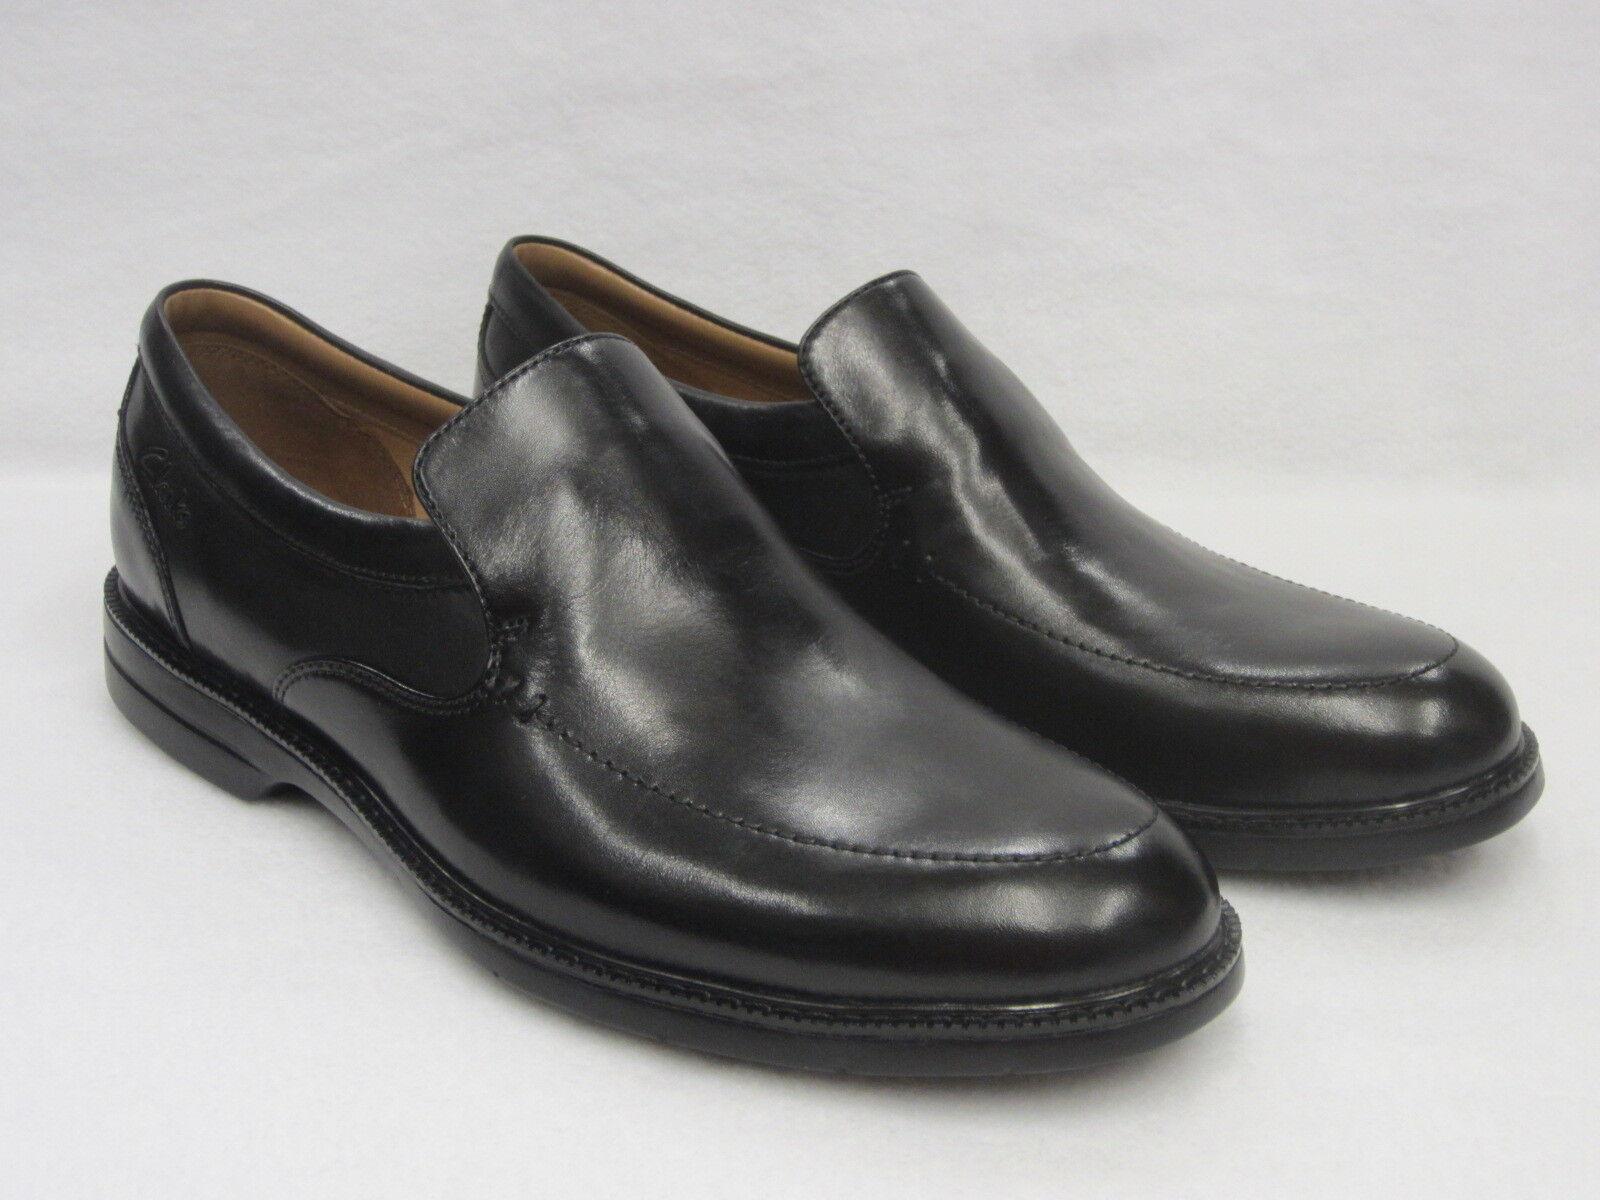 Clarks Hommes A Enfiler Chaussures Cuir Noir Bilton Step